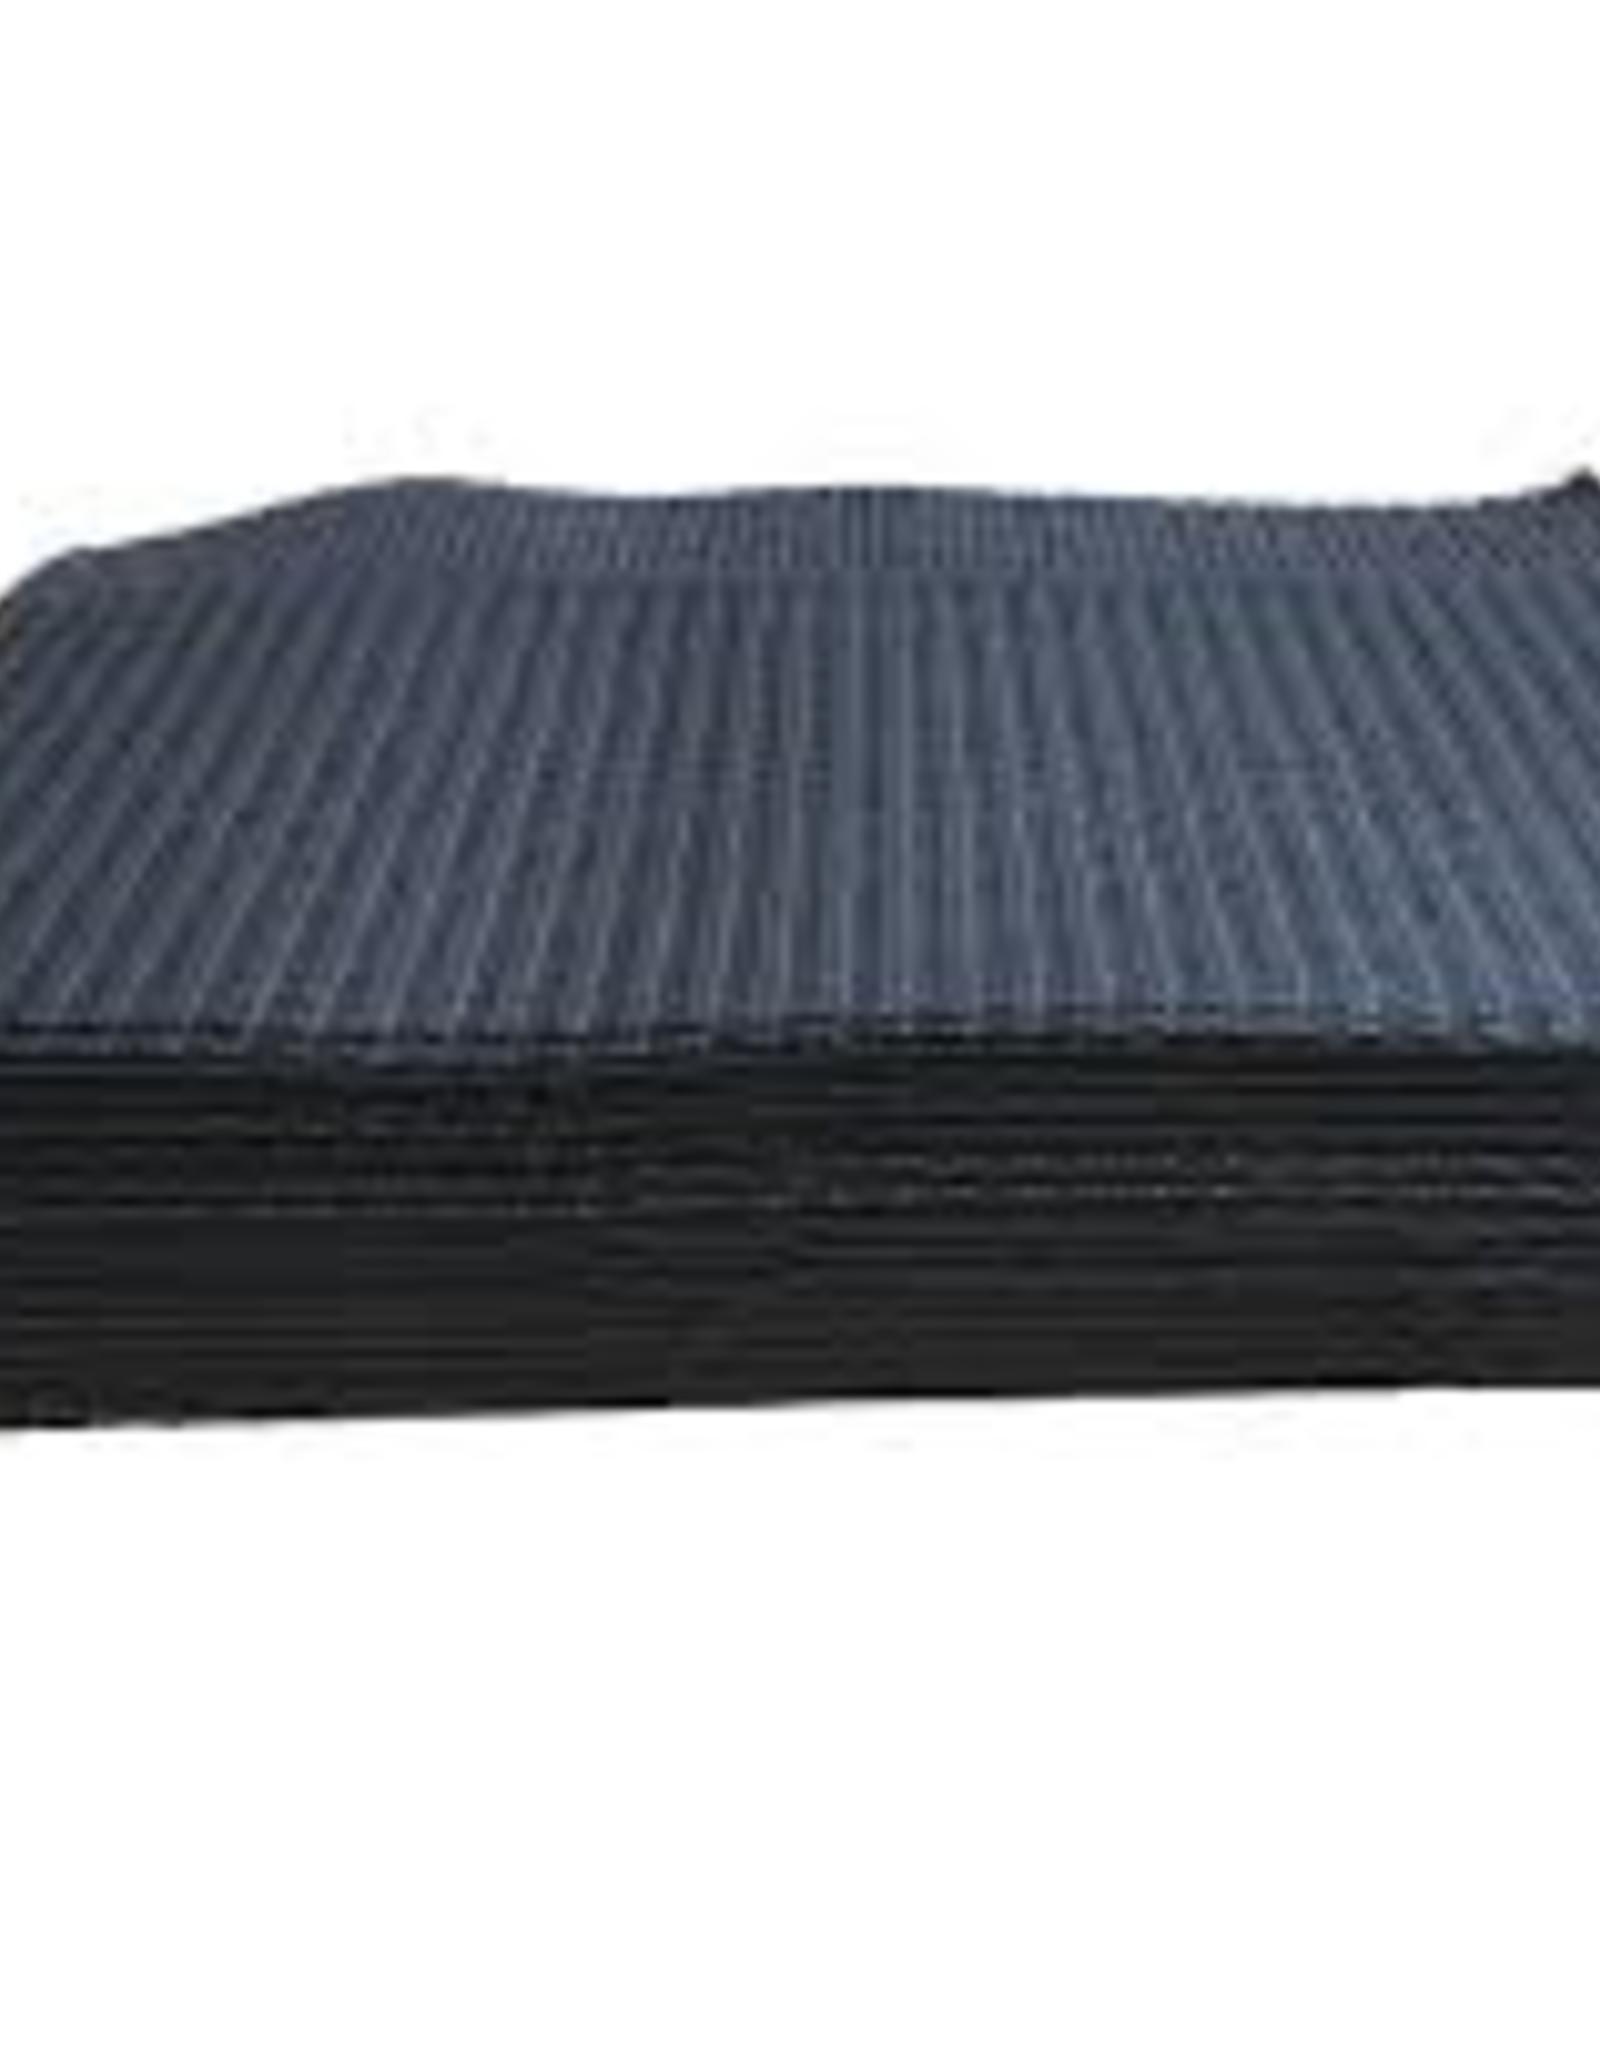 Urban Nails Table Towels 125 stuks Zwart